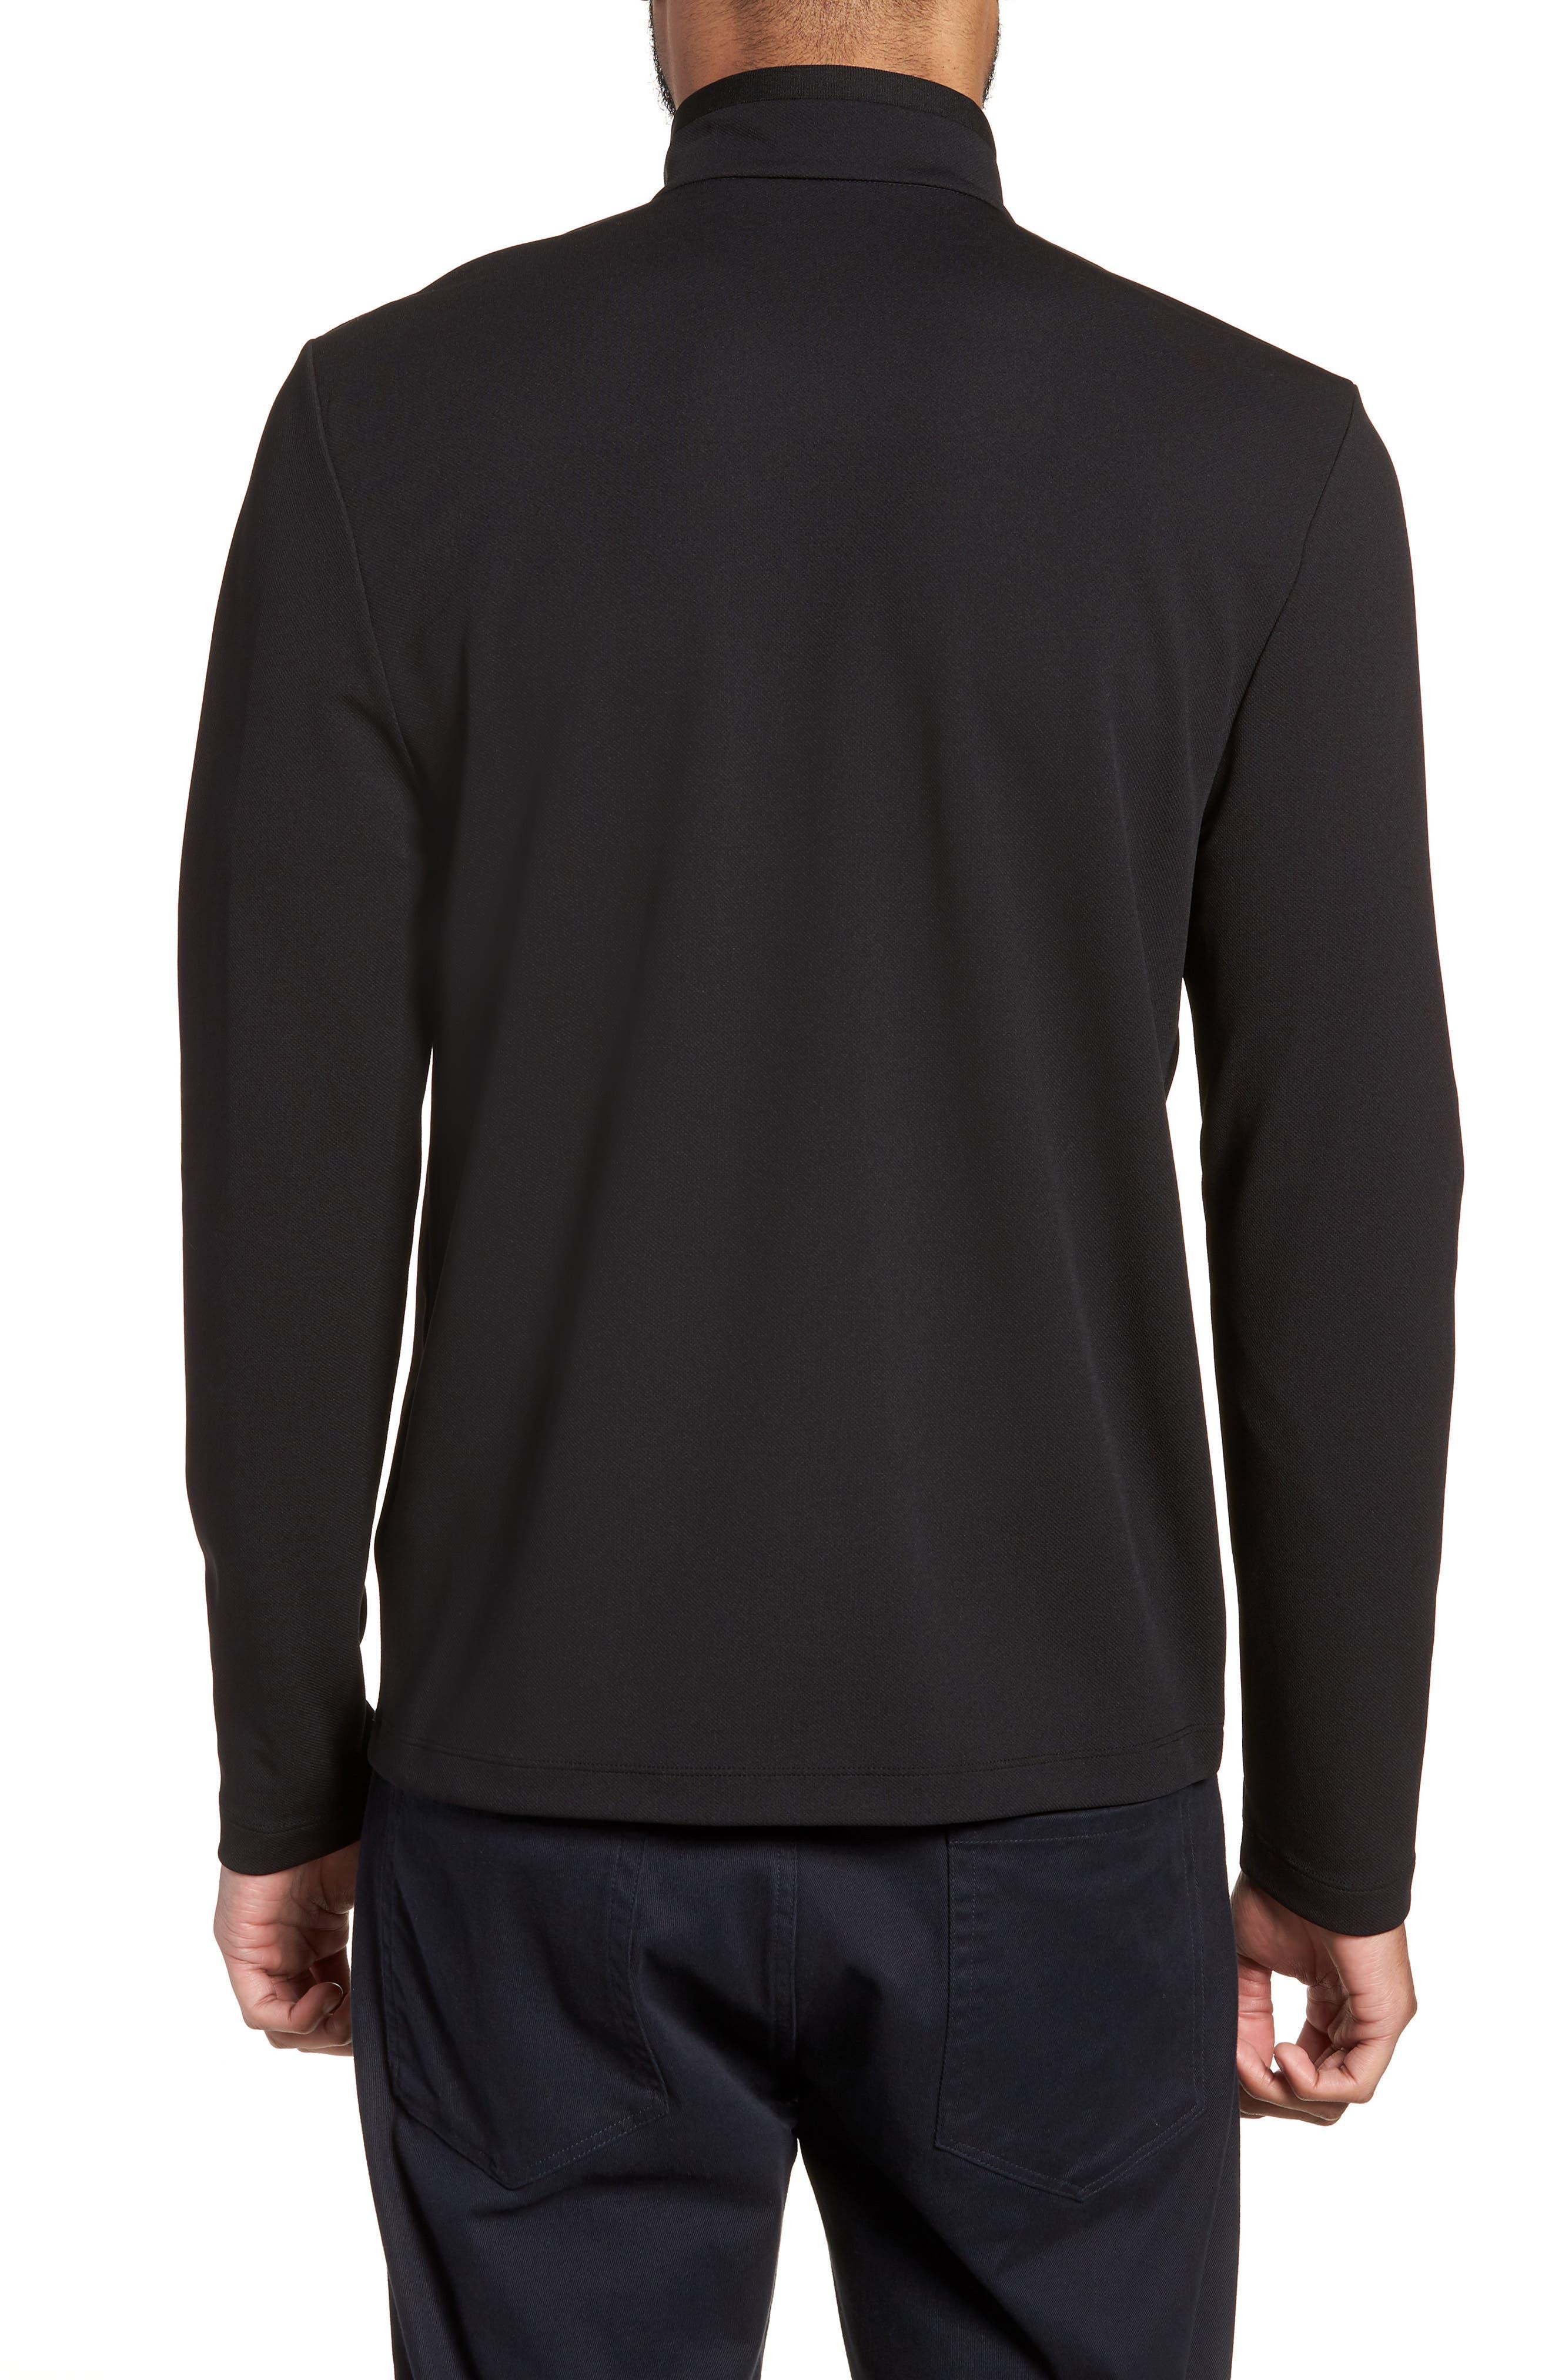 Performance Quarter Zip Pullover,                             Alternate thumbnail 2, color,                             Black/ Black